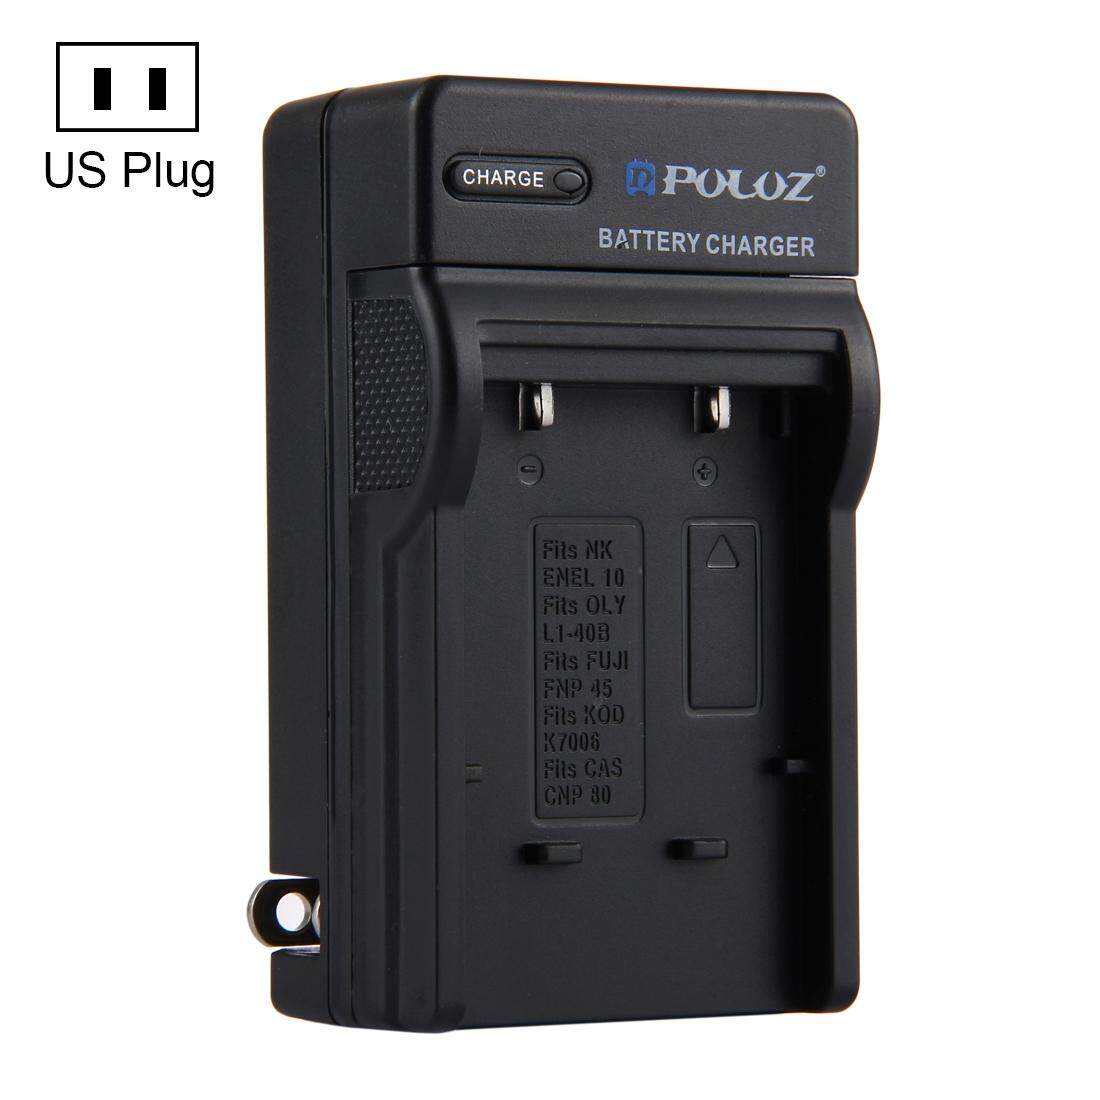 PULUZ US Plug Battery Charger for Nikon EN-EL10, Olympus LI-40B, FUJI FNP-45, Kodak K7006, CASIO CNP80 Battery - intl